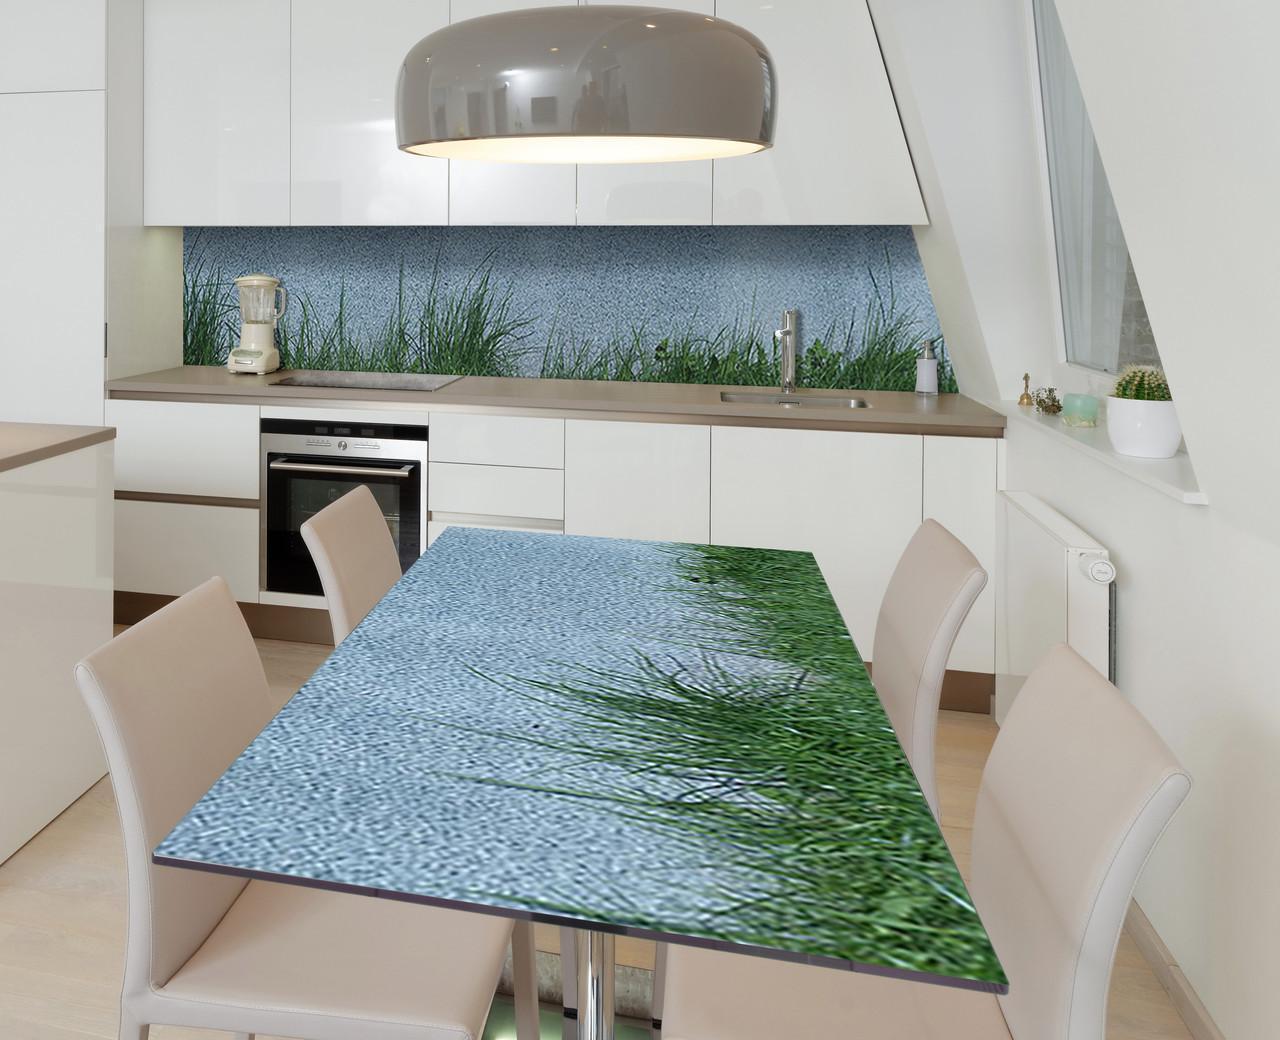 Наклейка 3Д виниловая на стол Zatarga «На мягкой траве» 600х1200 мм для домов, квартир, столов, кофейн, кафе